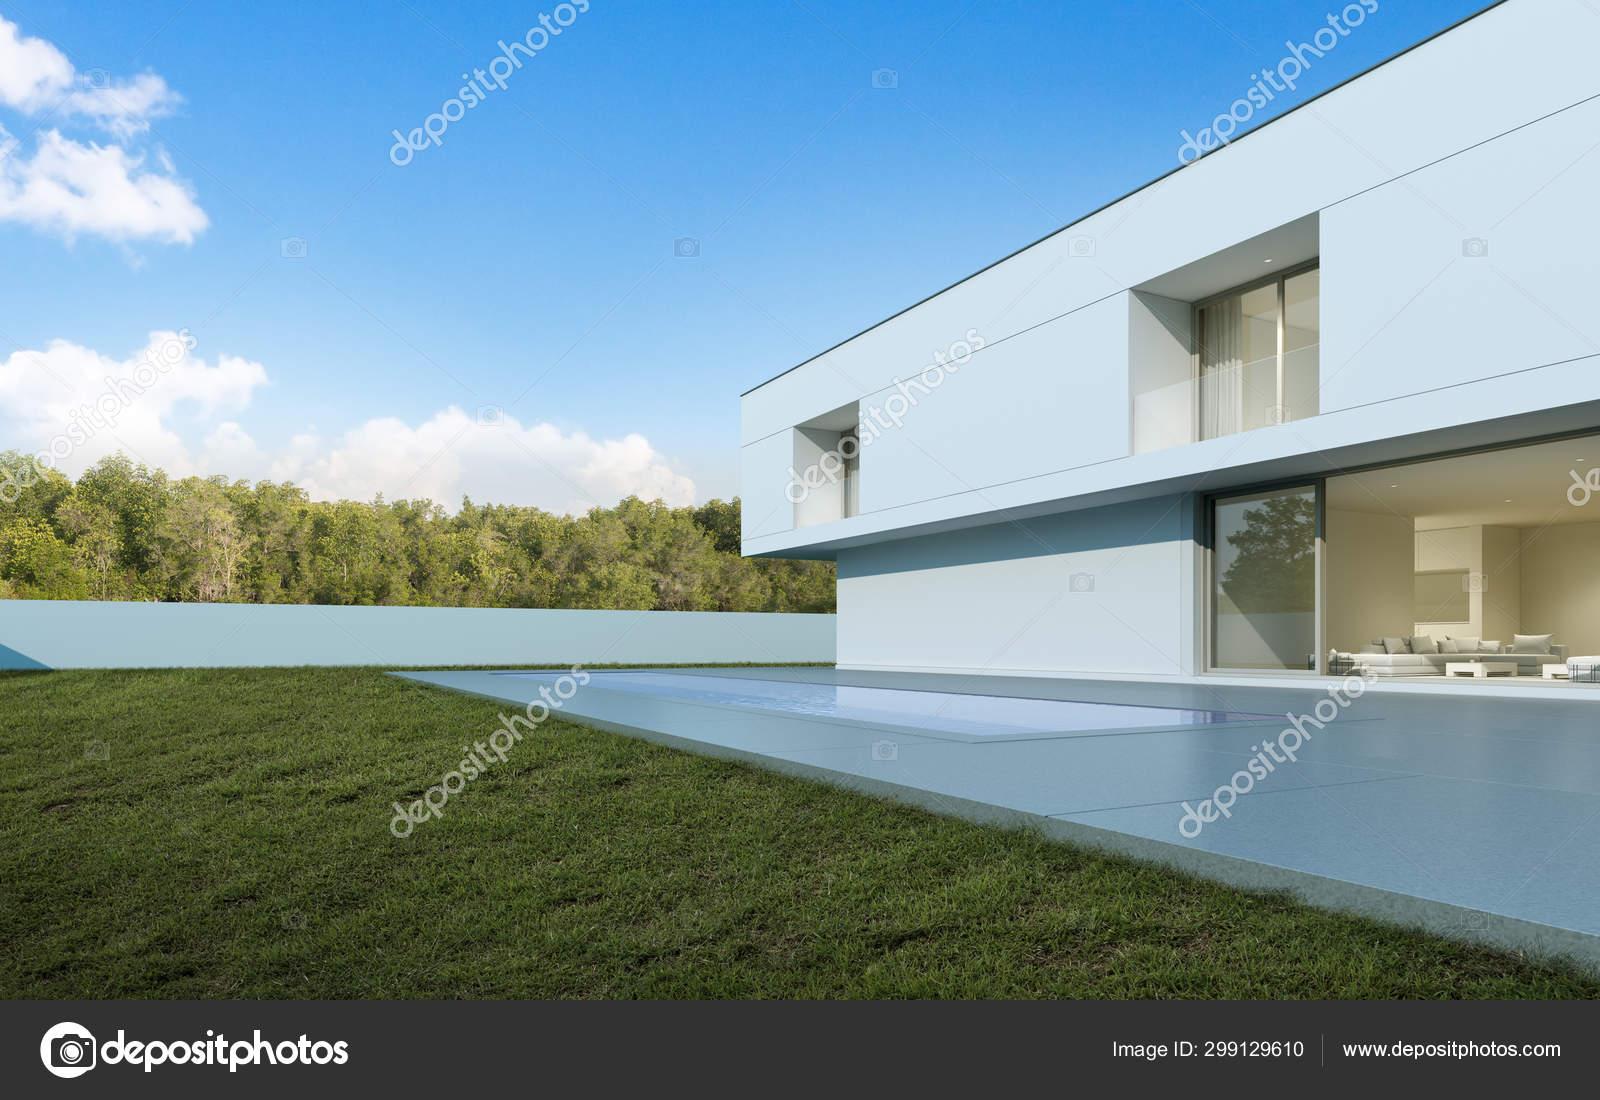 Perspective Maison Moderne Blanche Luxe Avec Piscine Cour ...